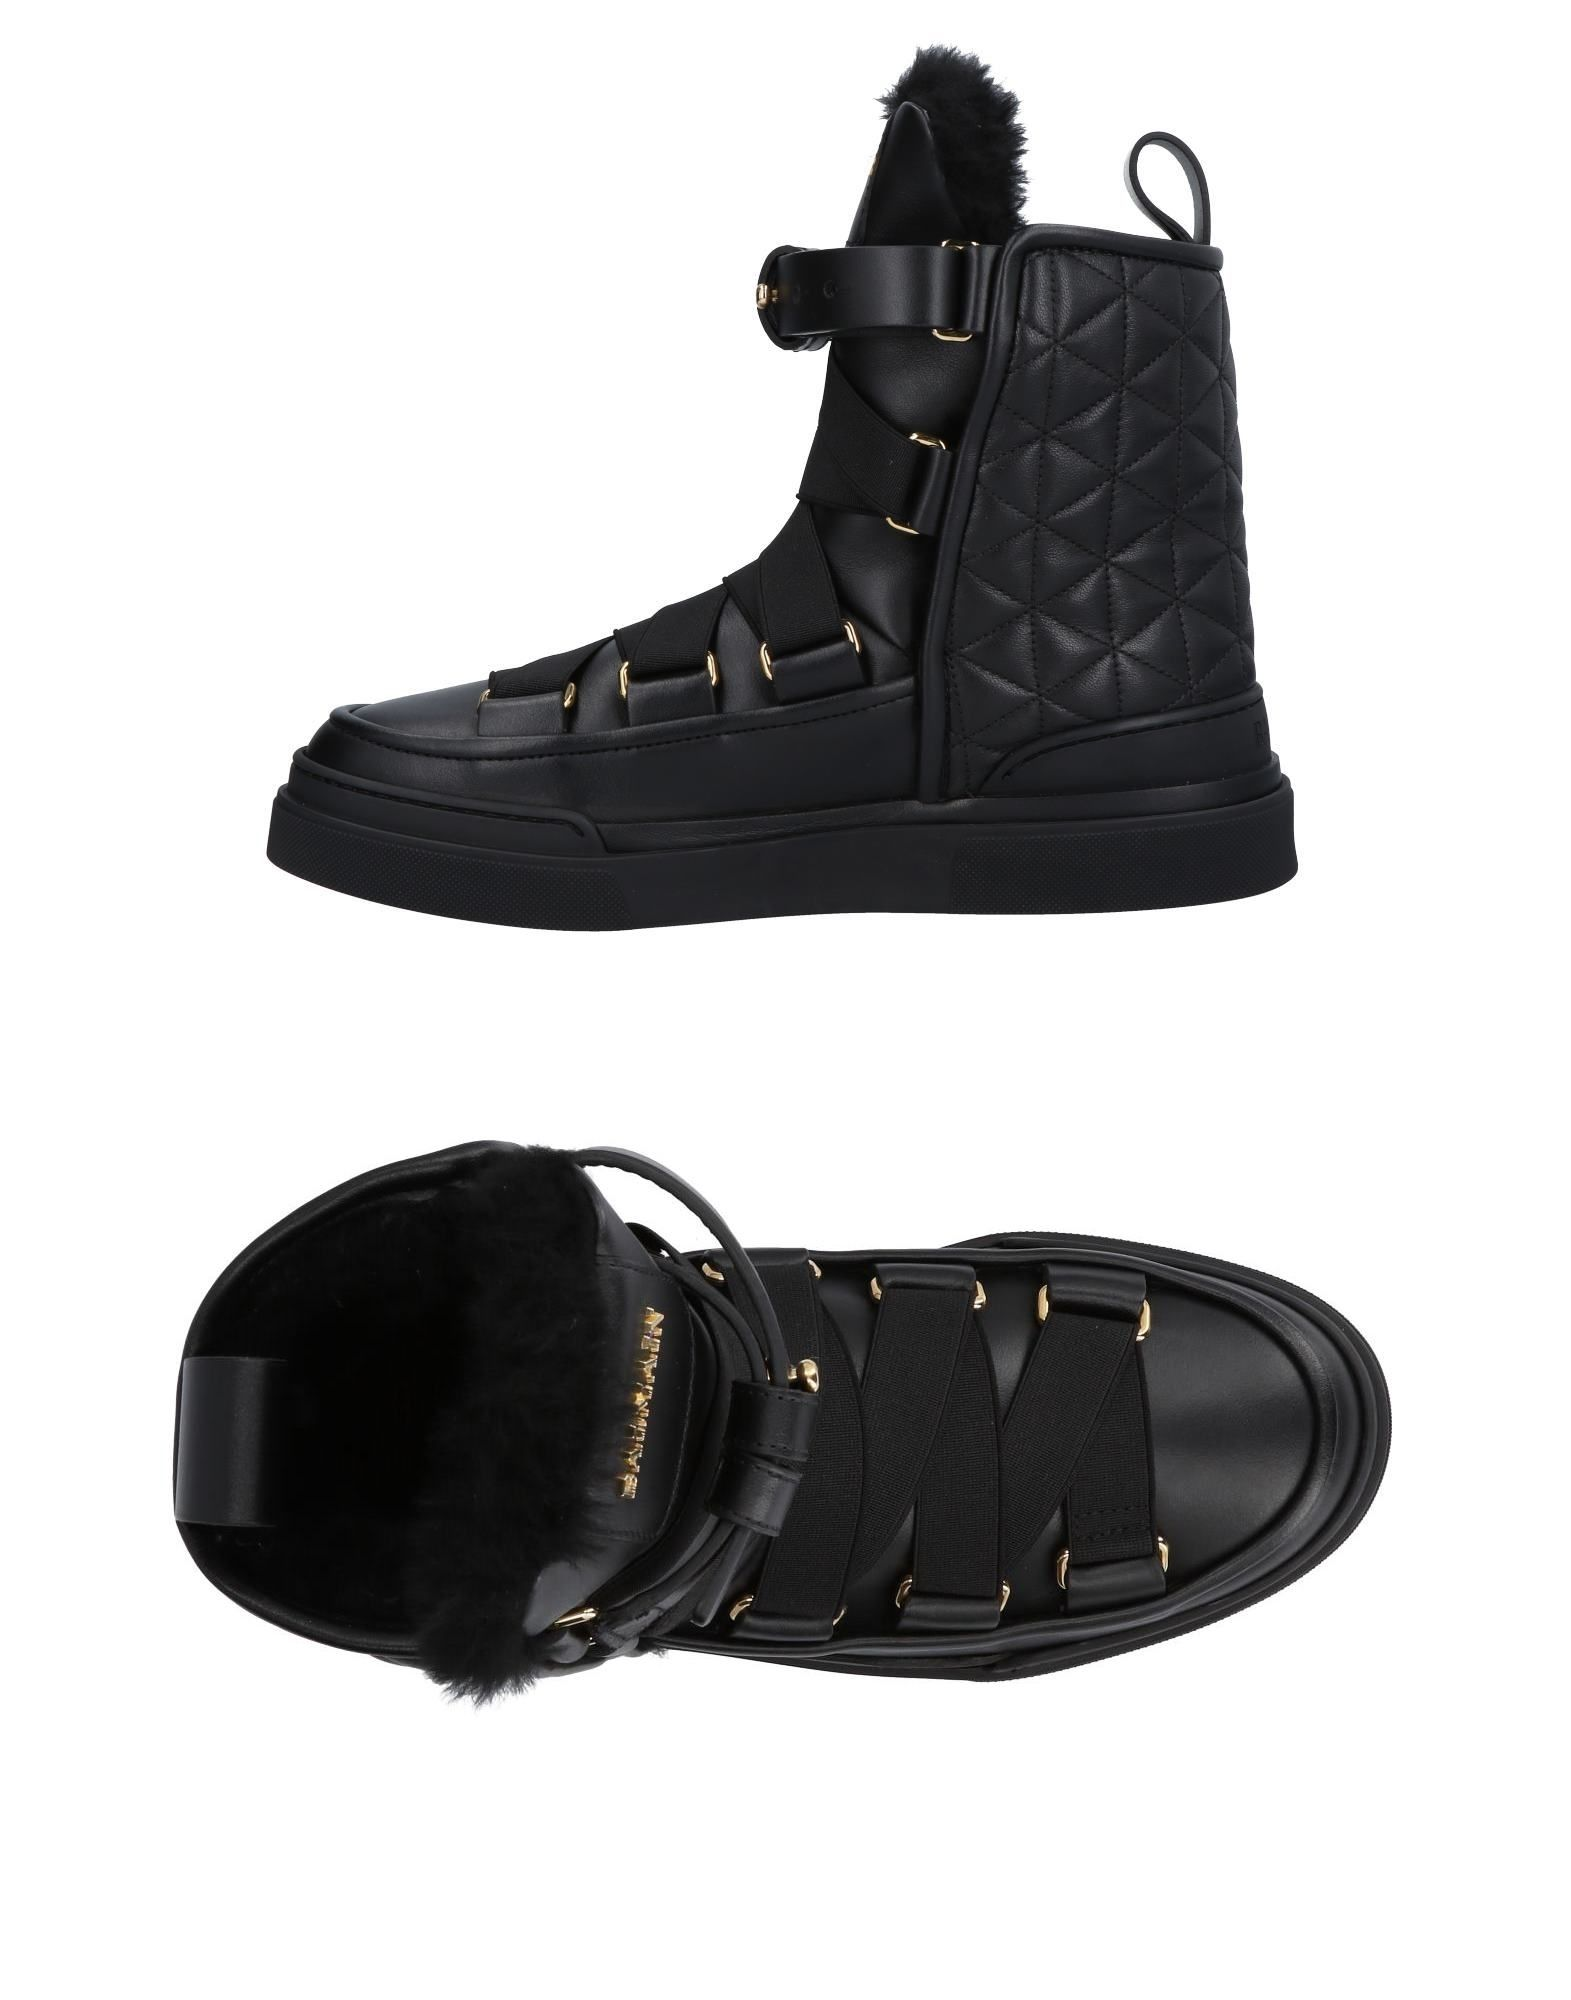 A buon mercato Sneakers Balmain Donna - 11465543NJ